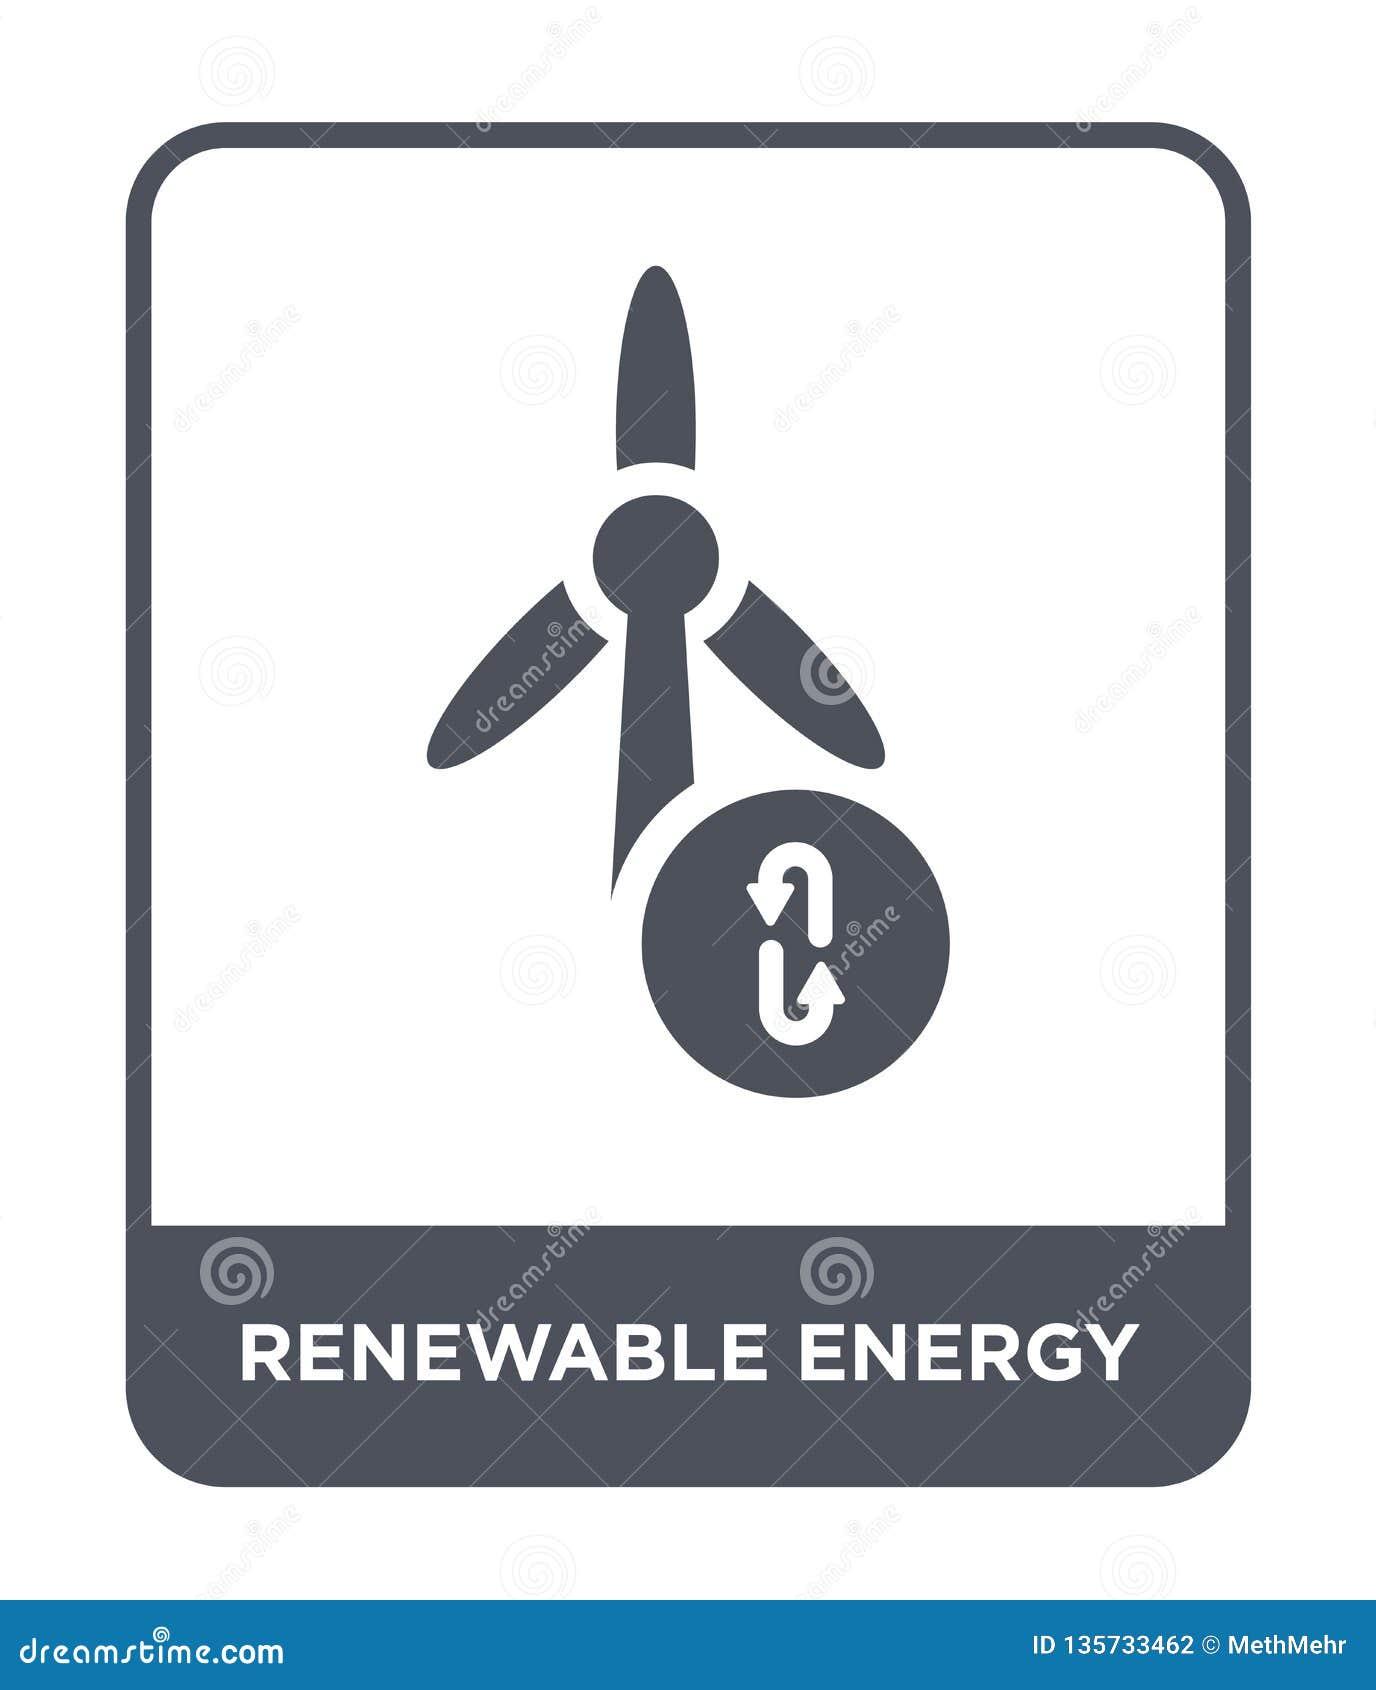 renewable energy icon in trendy design style. renewable energy icon isolated on white background. renewable energy vector icon